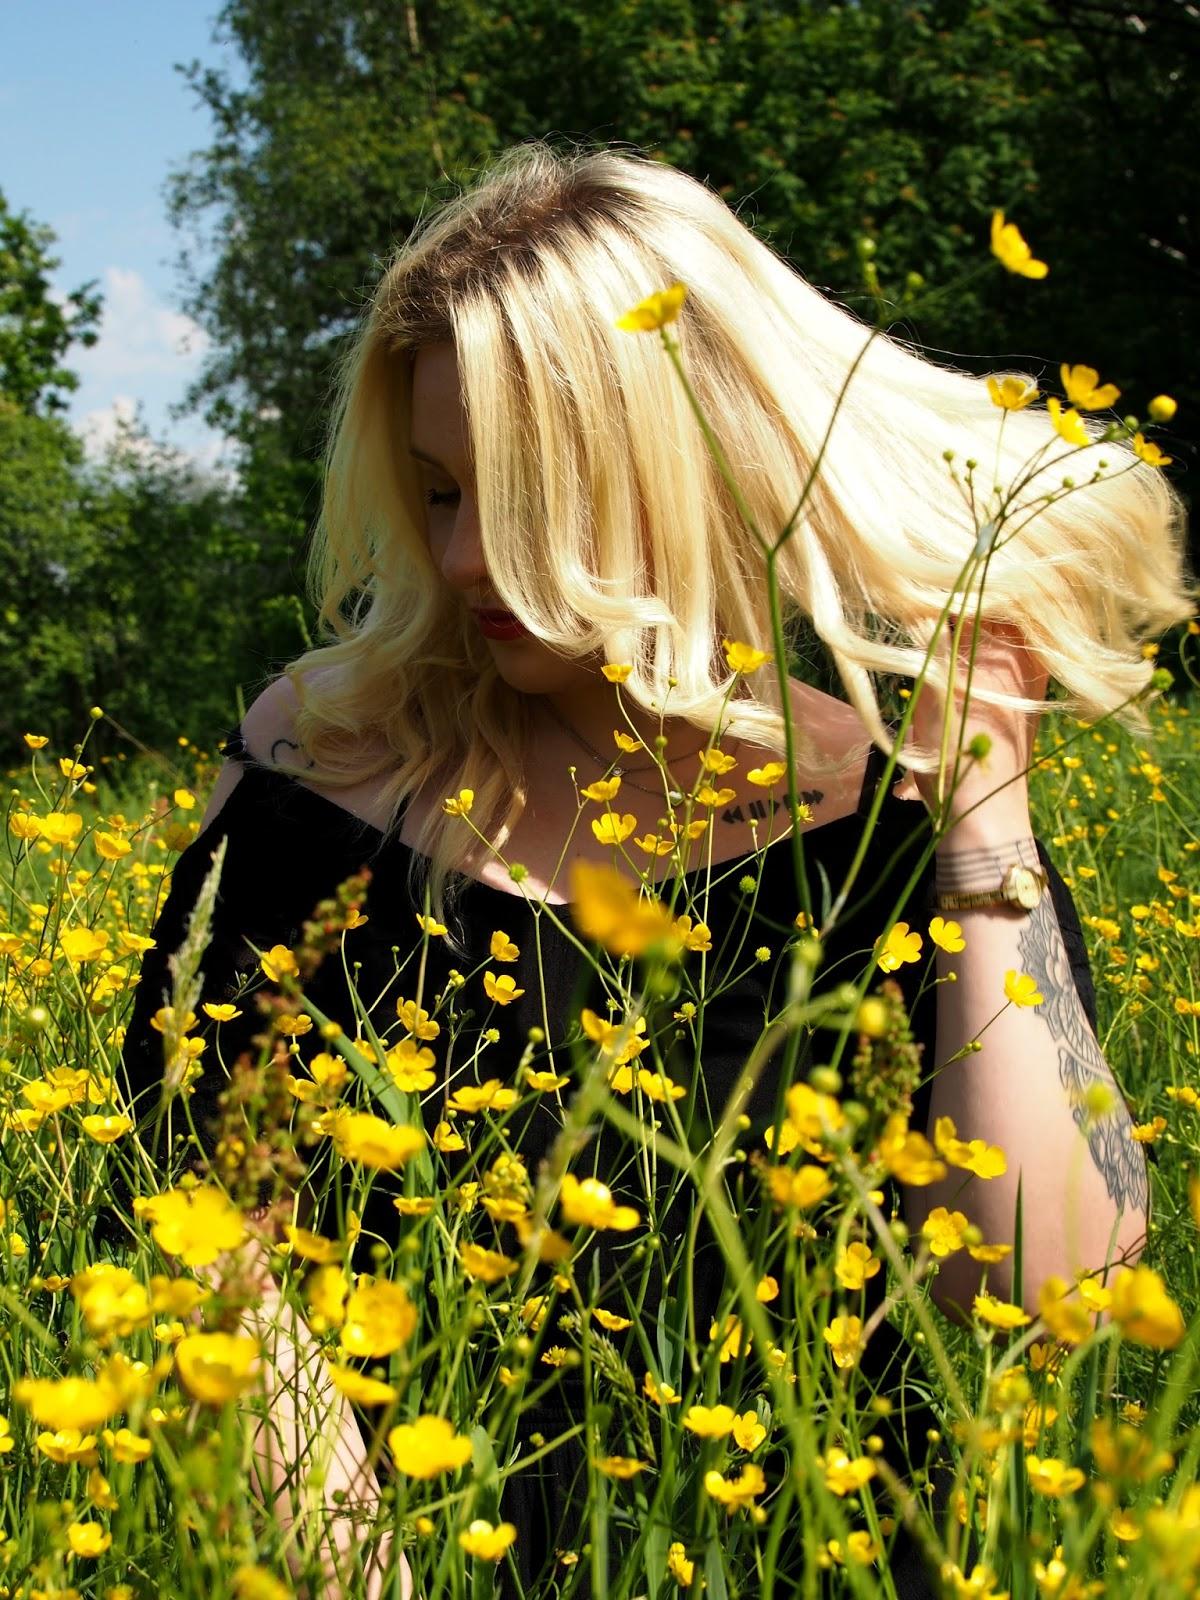 YELLOW FLOWERS 29/05/17